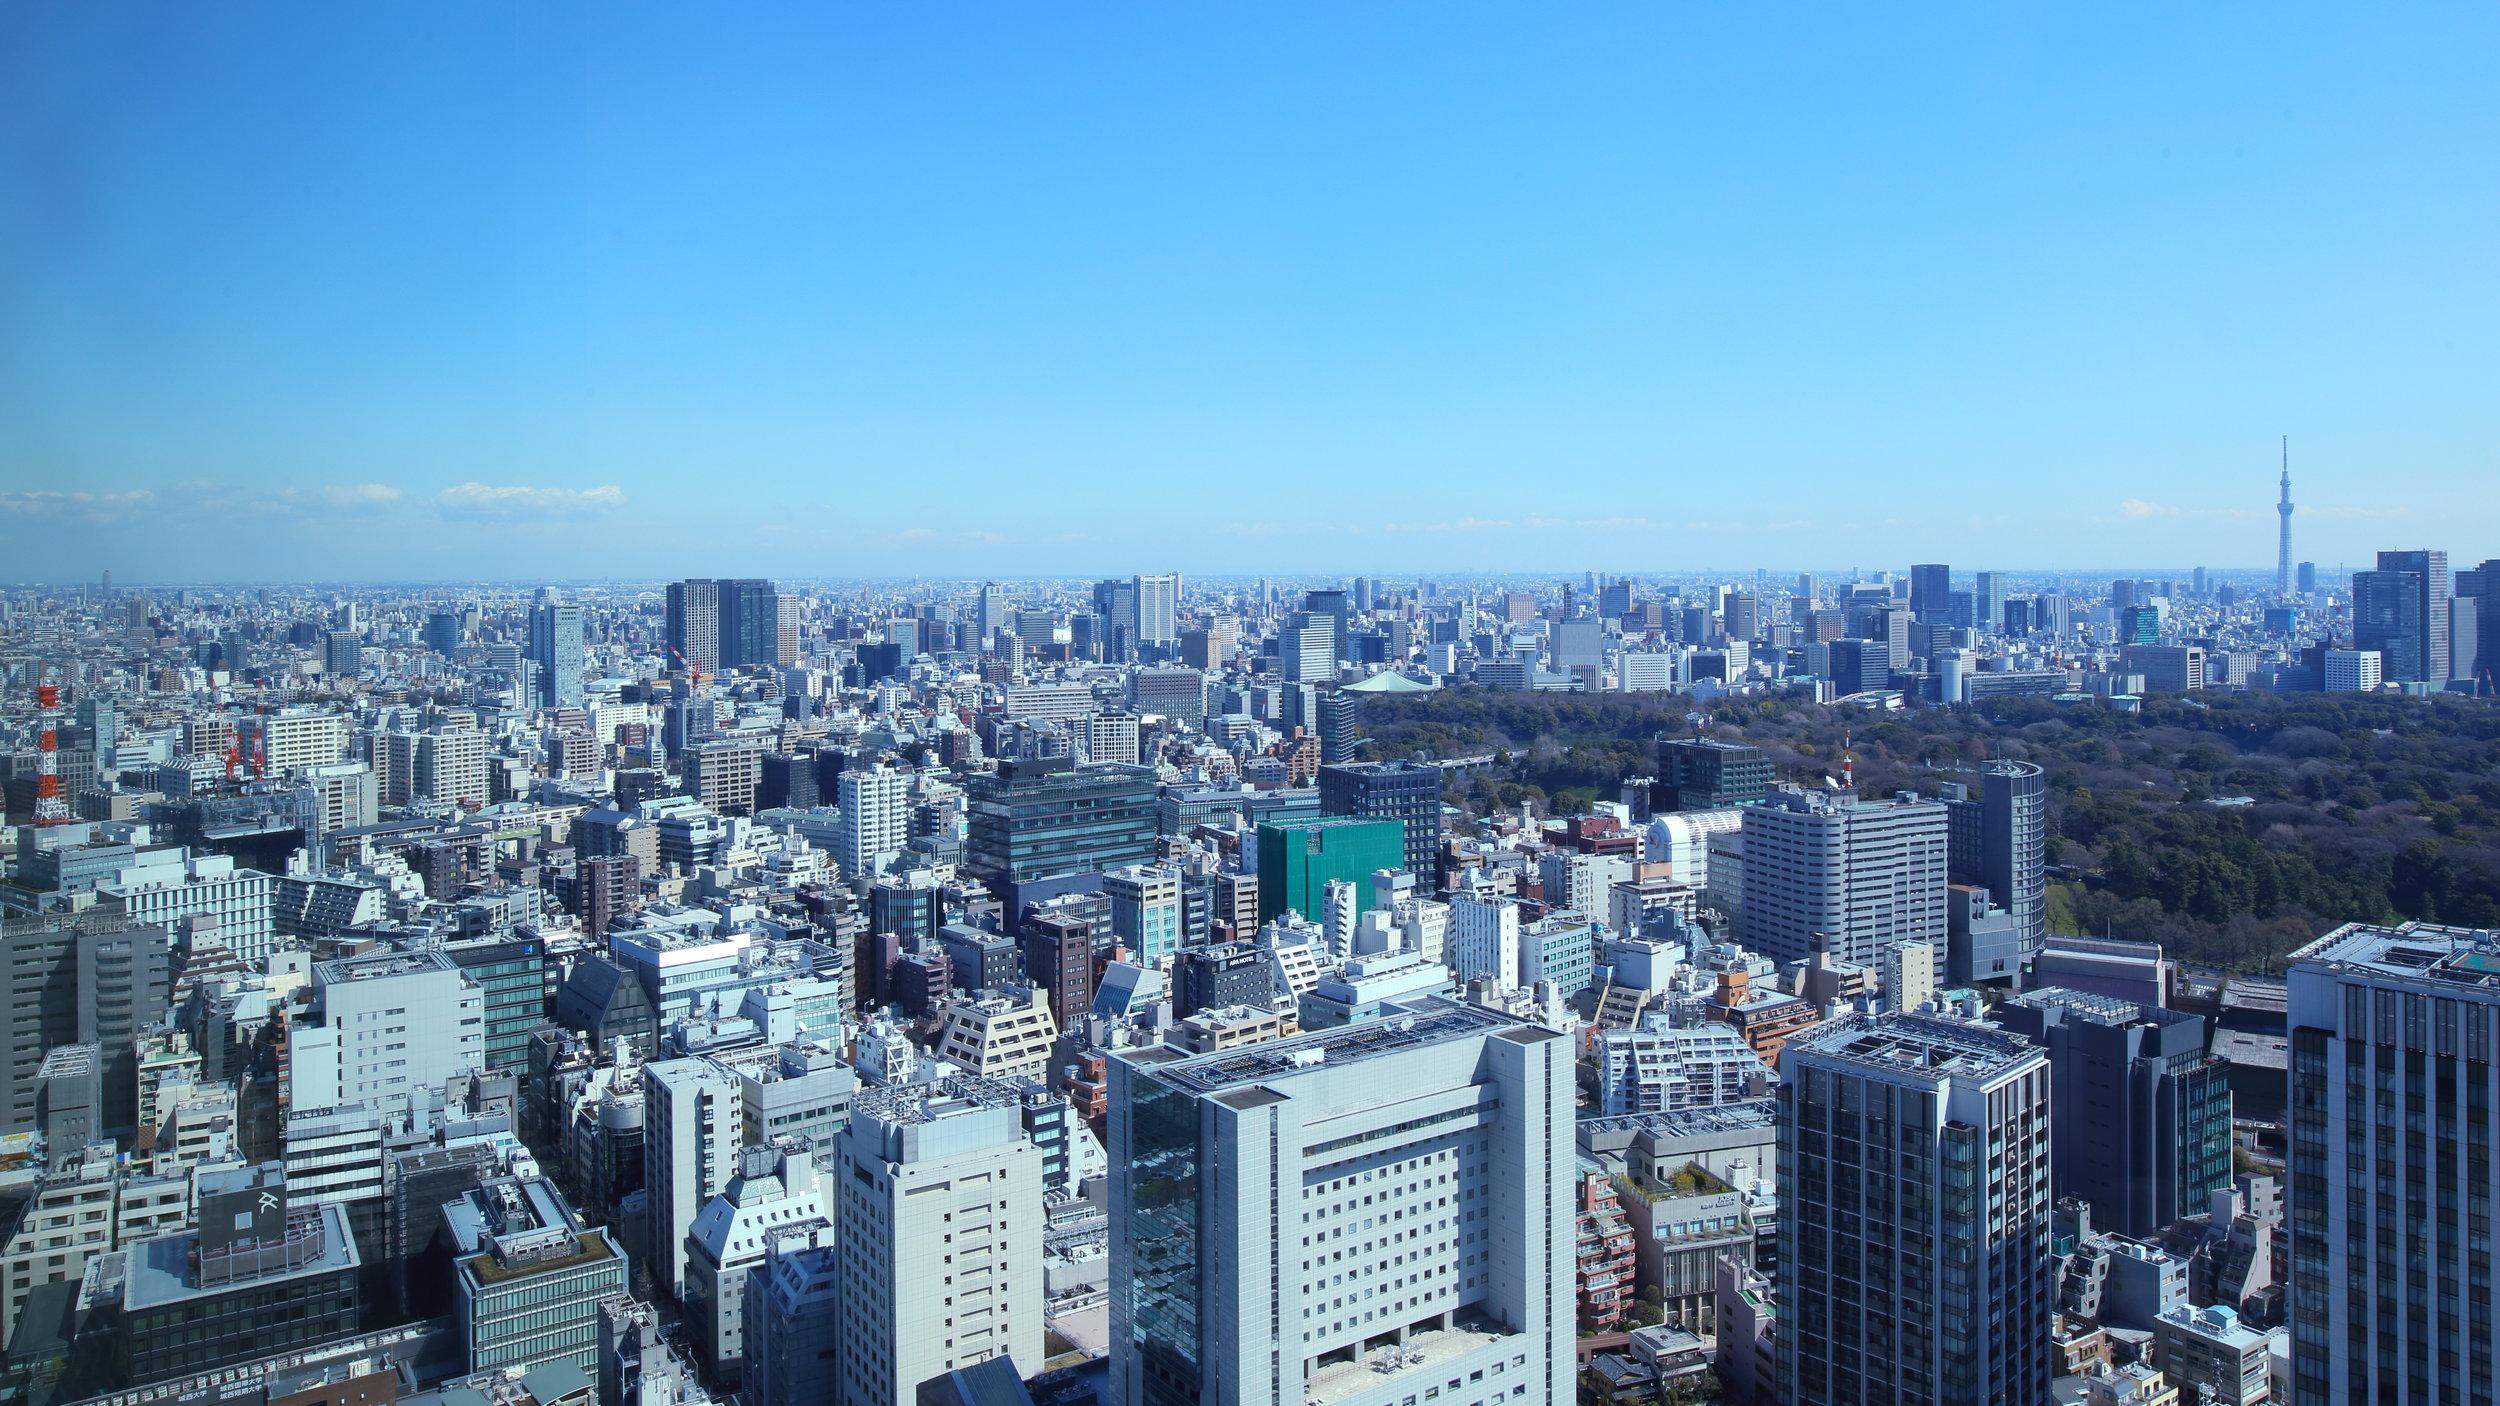 Tokyo (April 2017). Photo by Naomi Waltham-Smith.